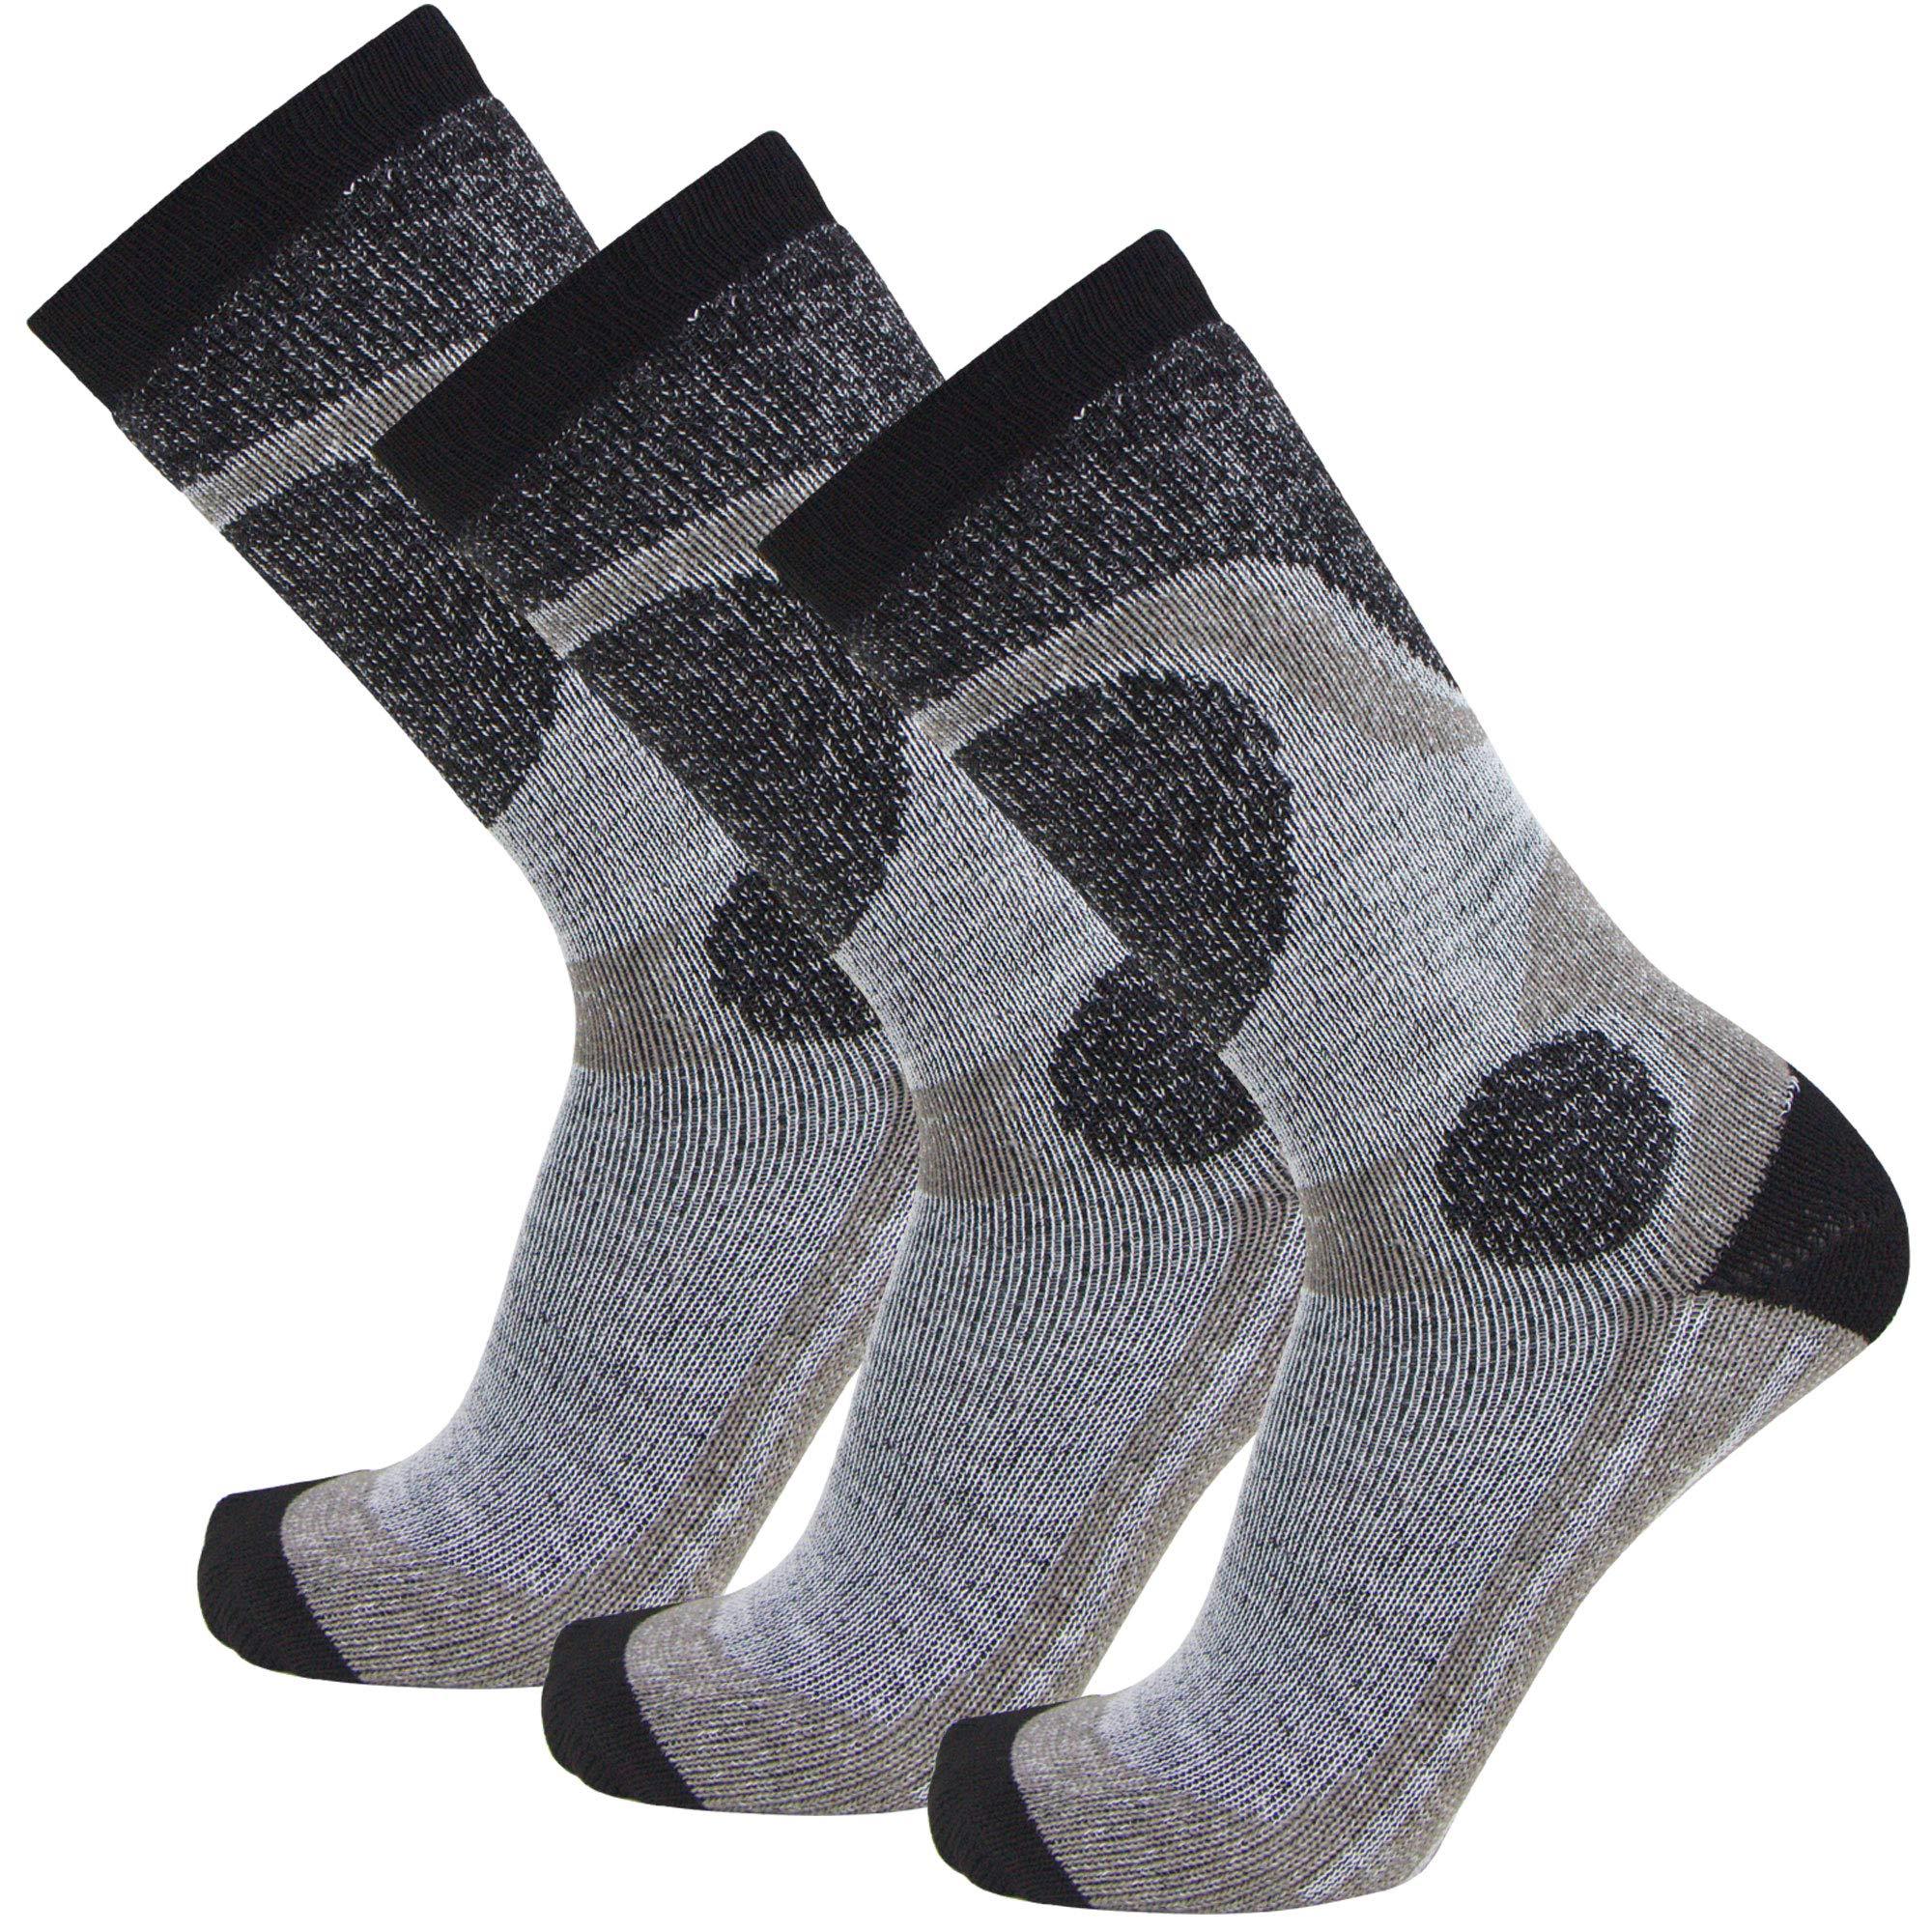 Pure Athlete Elite Ski Socks for Boys and Girls - Kids Merino Wool Youth Snowboard